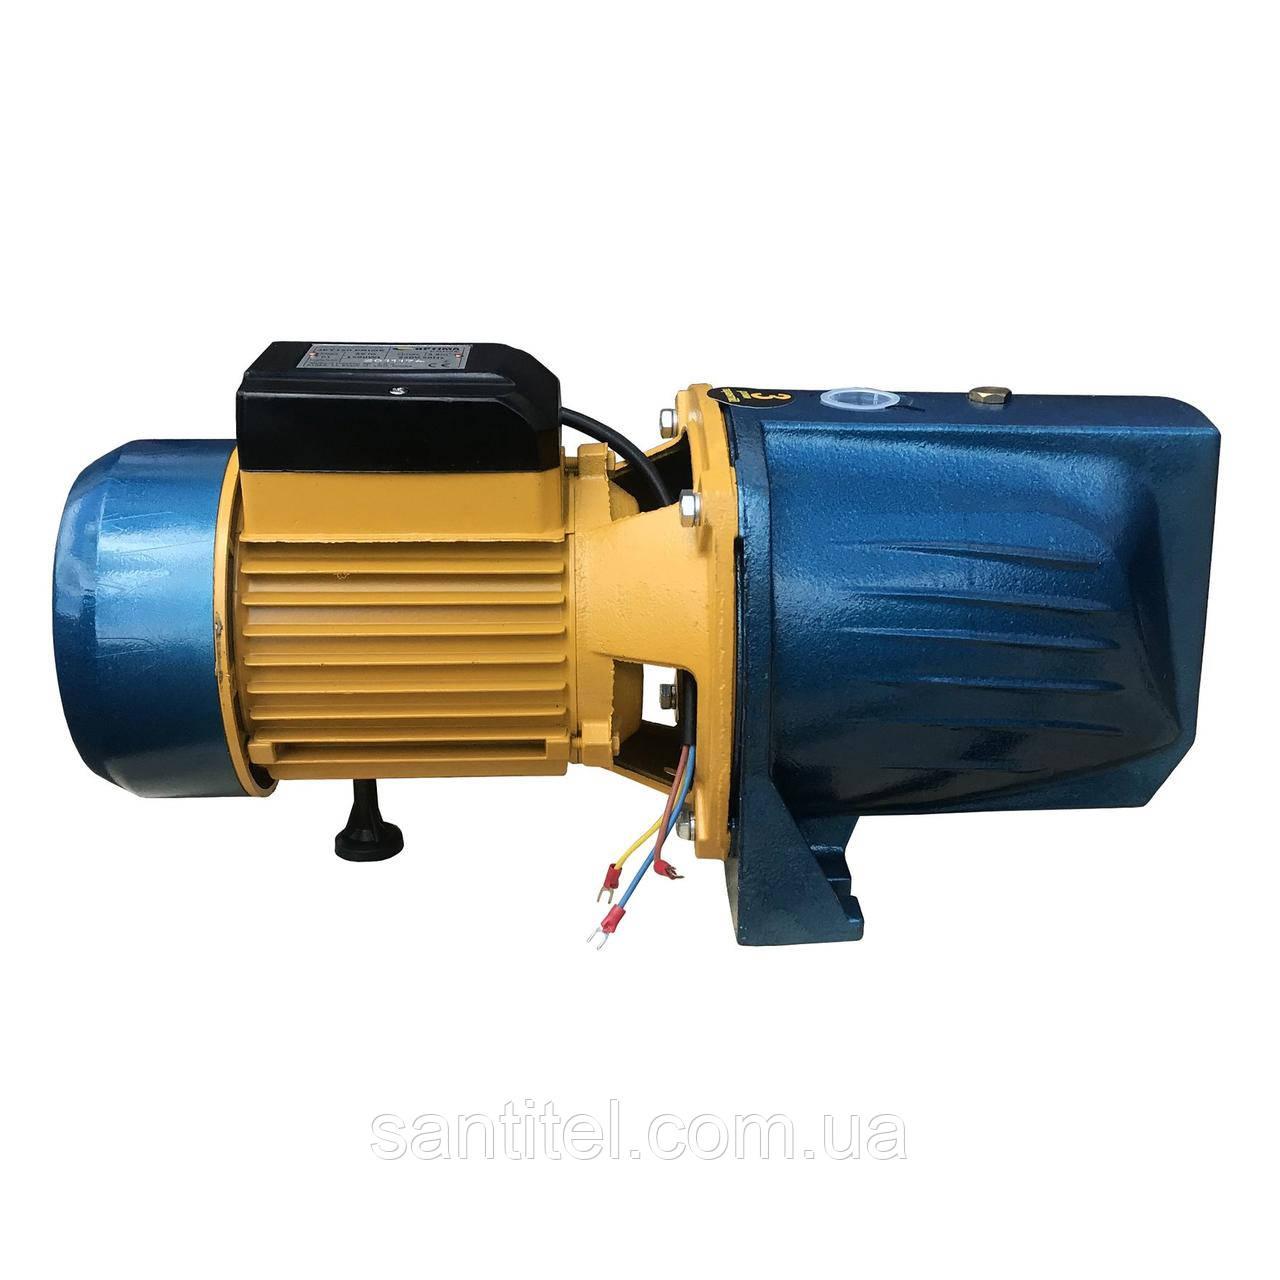 Насос центробежный Optima JET150 PRIME 1,5кВт